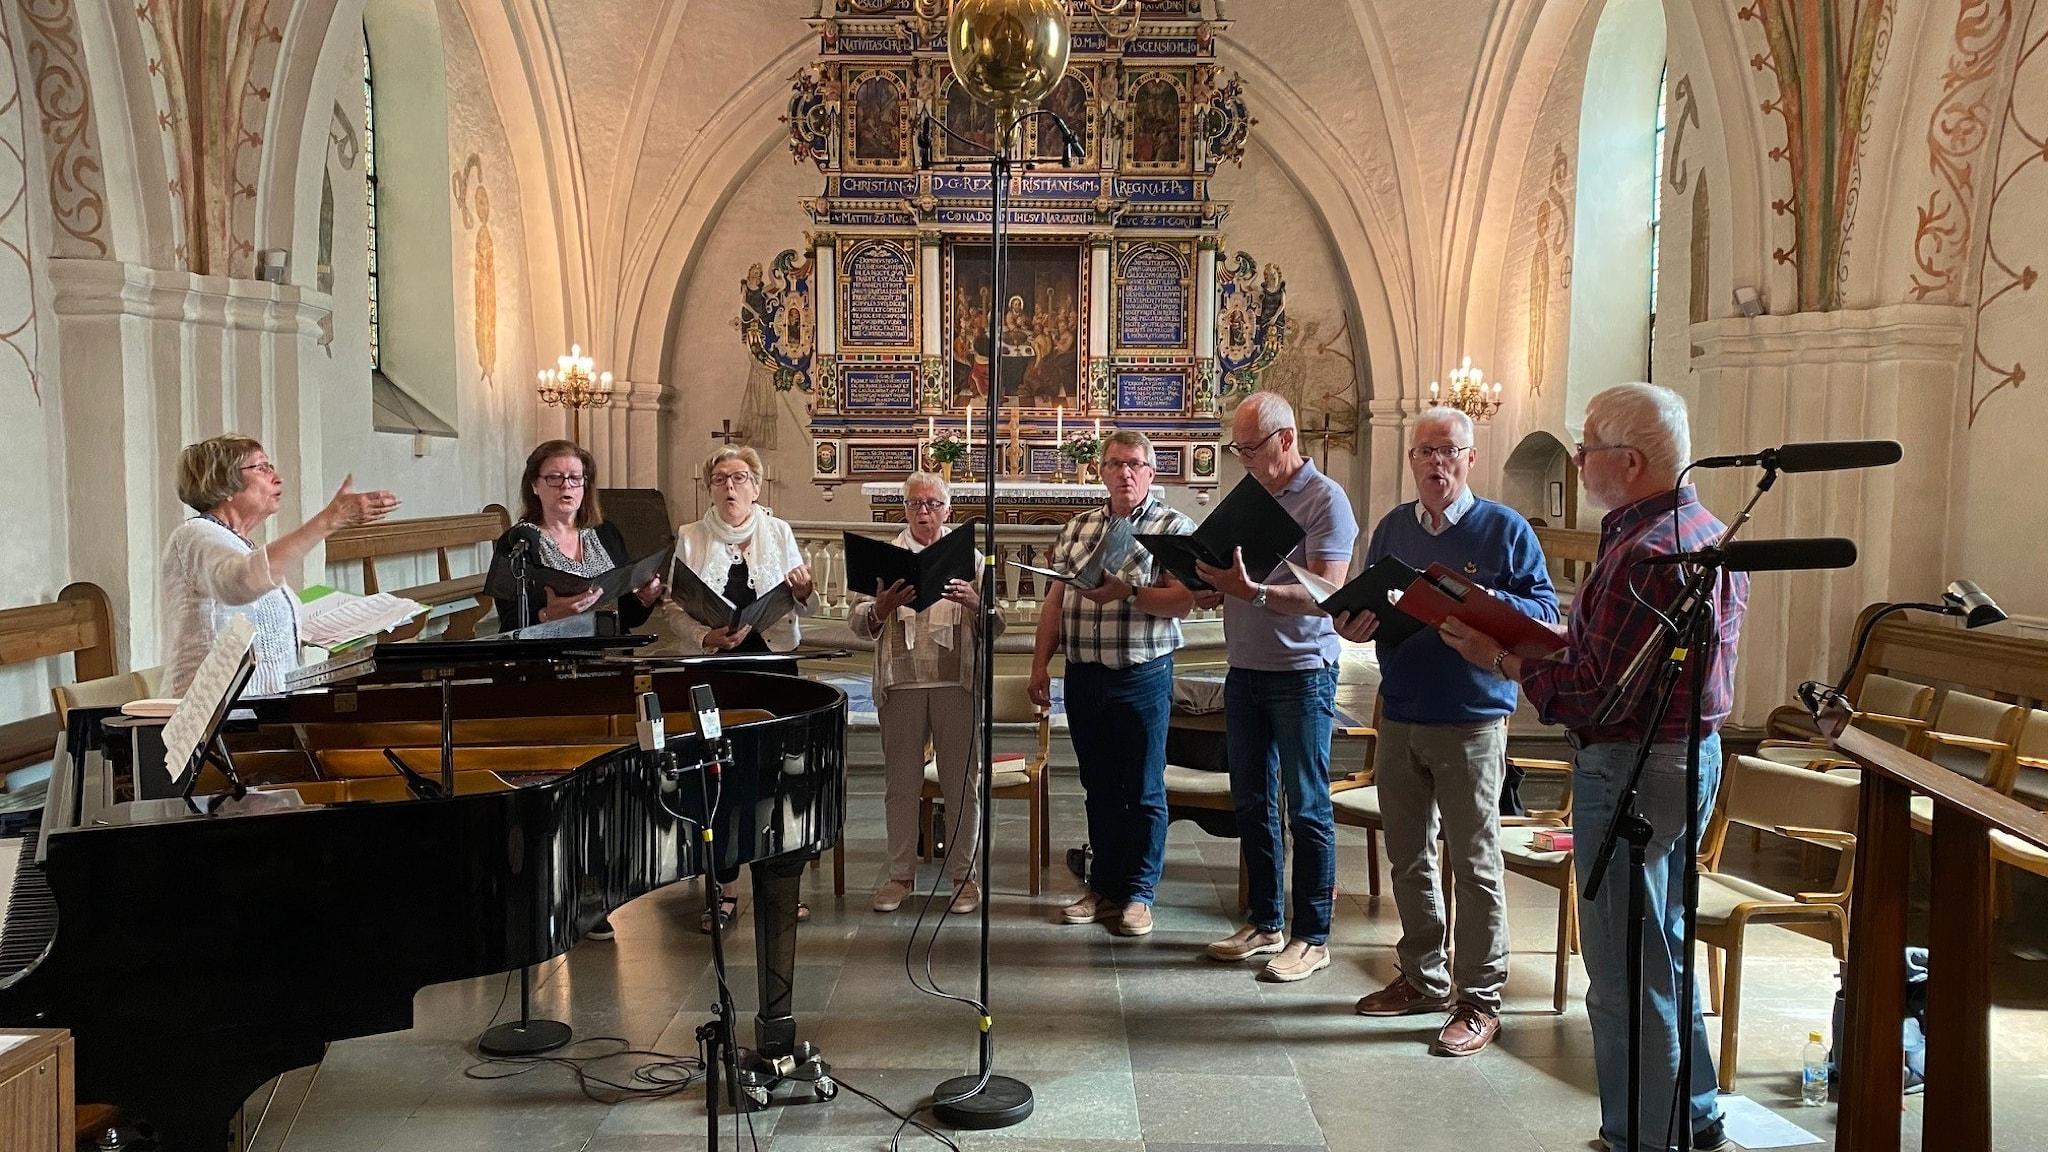 Sången framförs av kören Crimond.